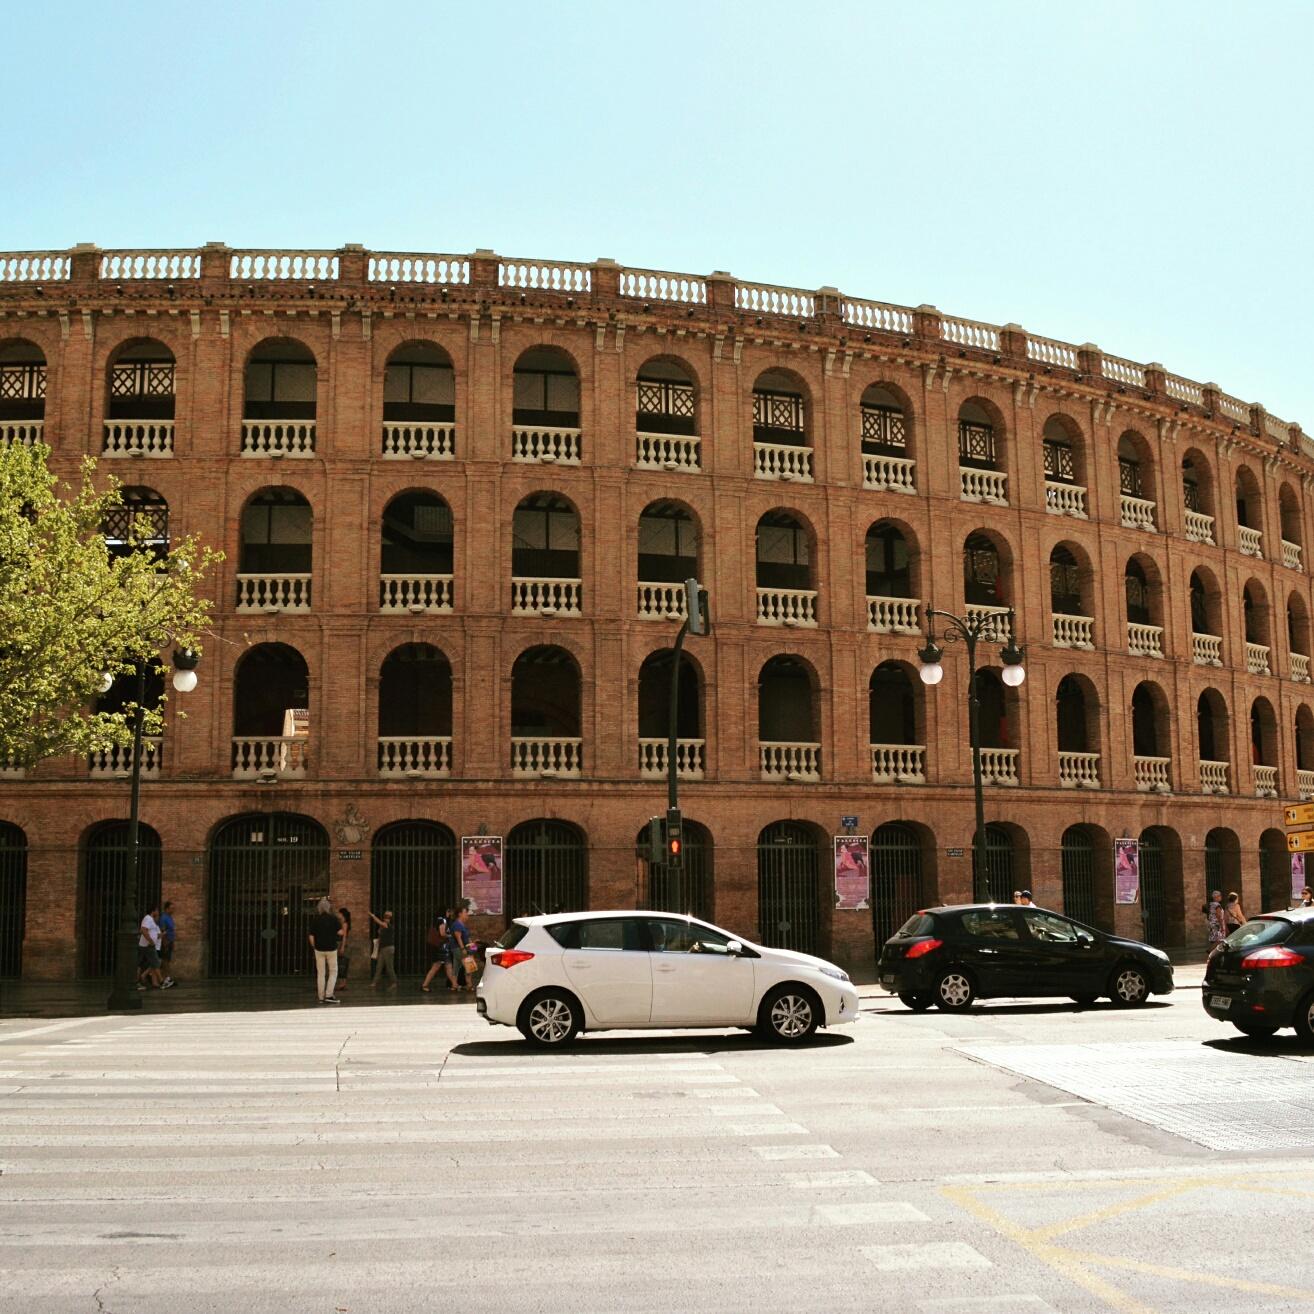 CoverMore_Lisa_Owen_Spain_Valencia_Bullring.jpg